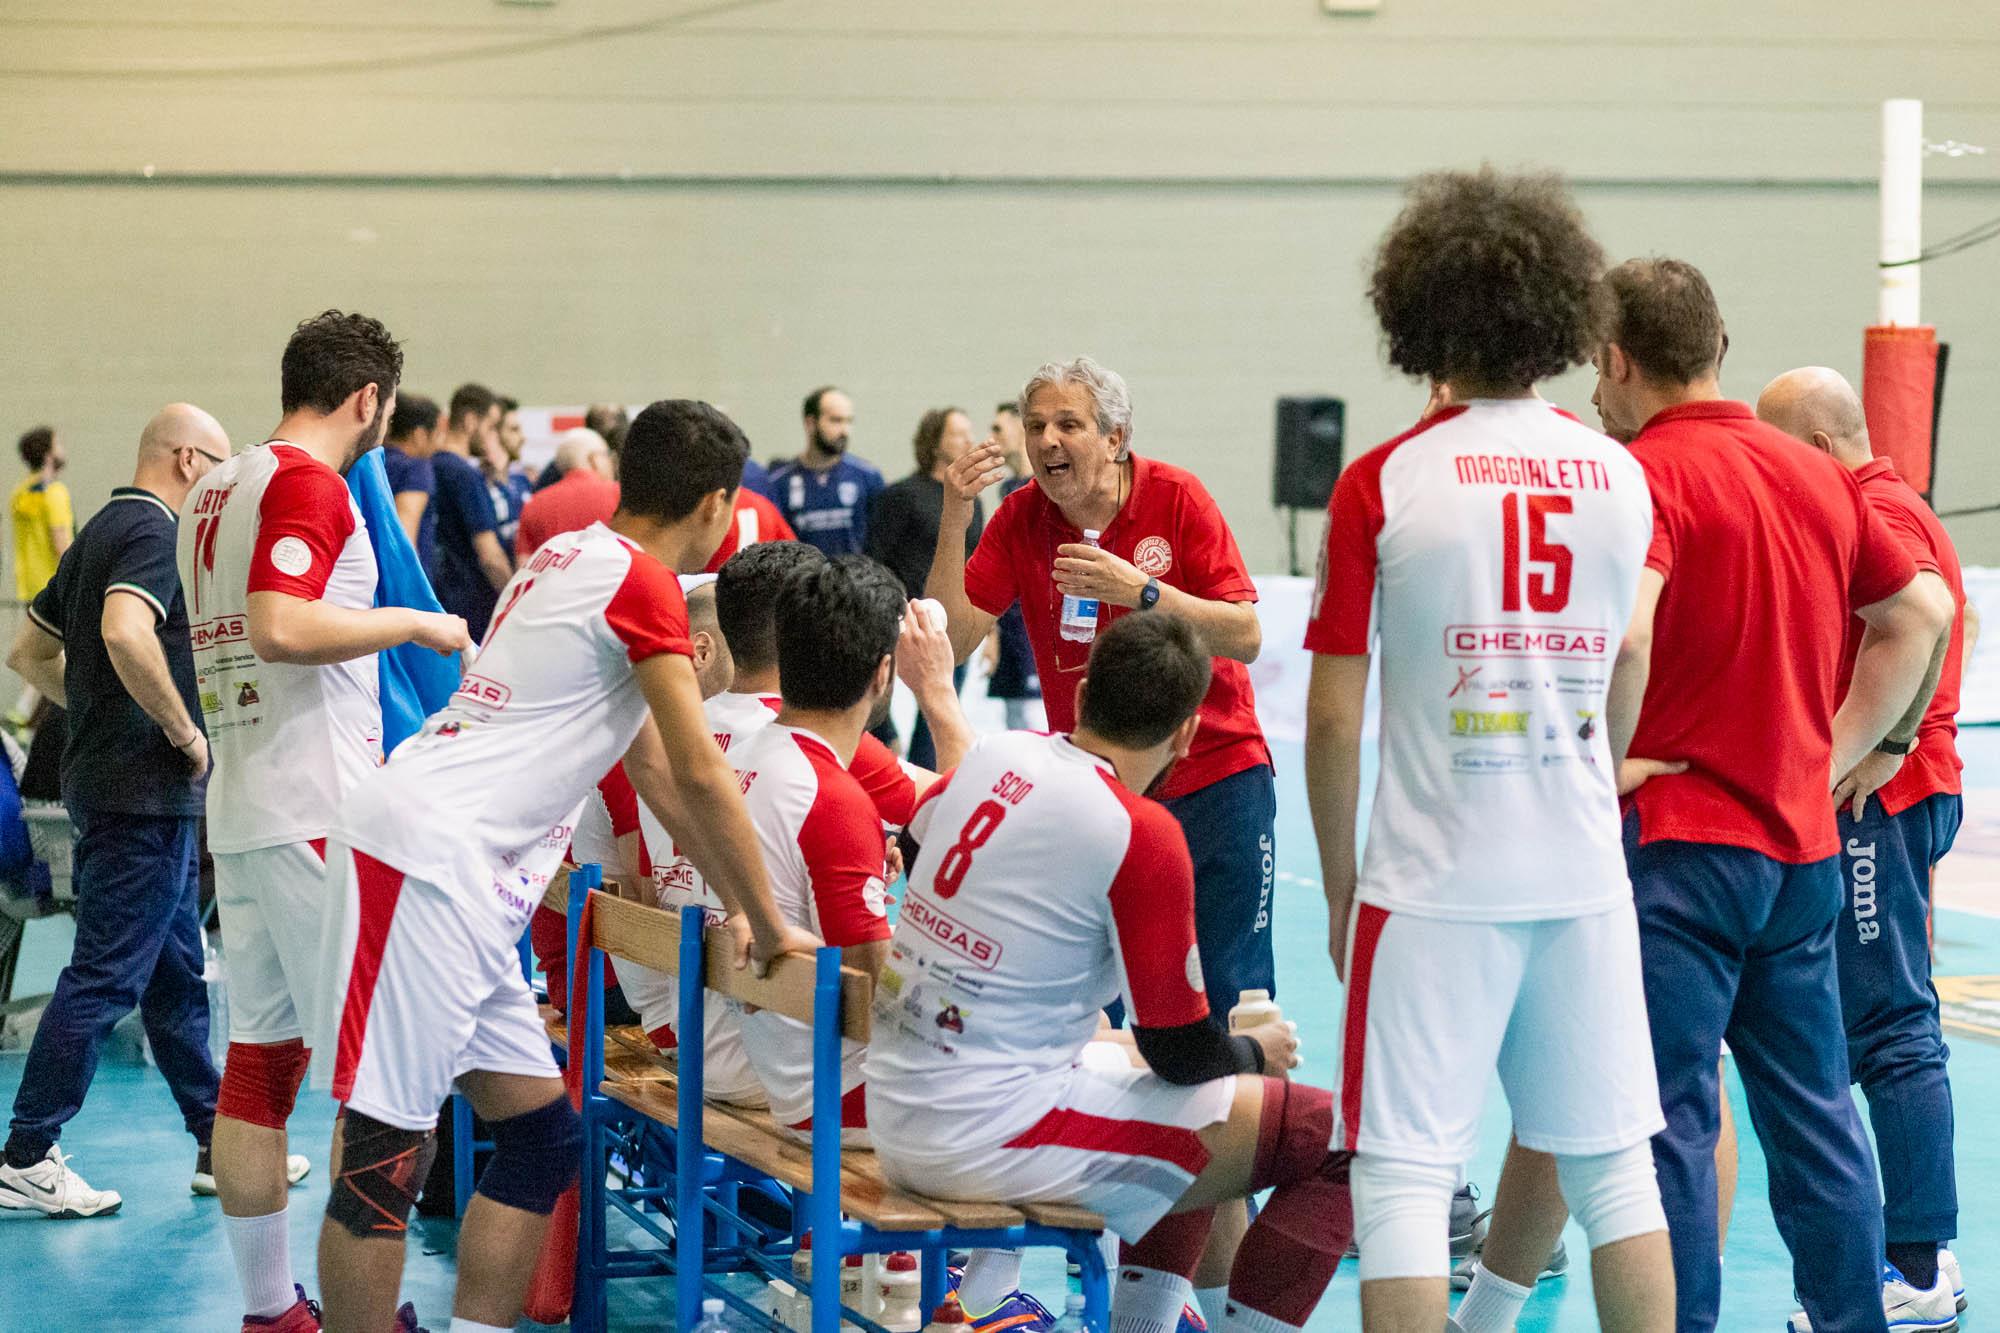 La M2G Group Bari chiude a Pineto la regular season